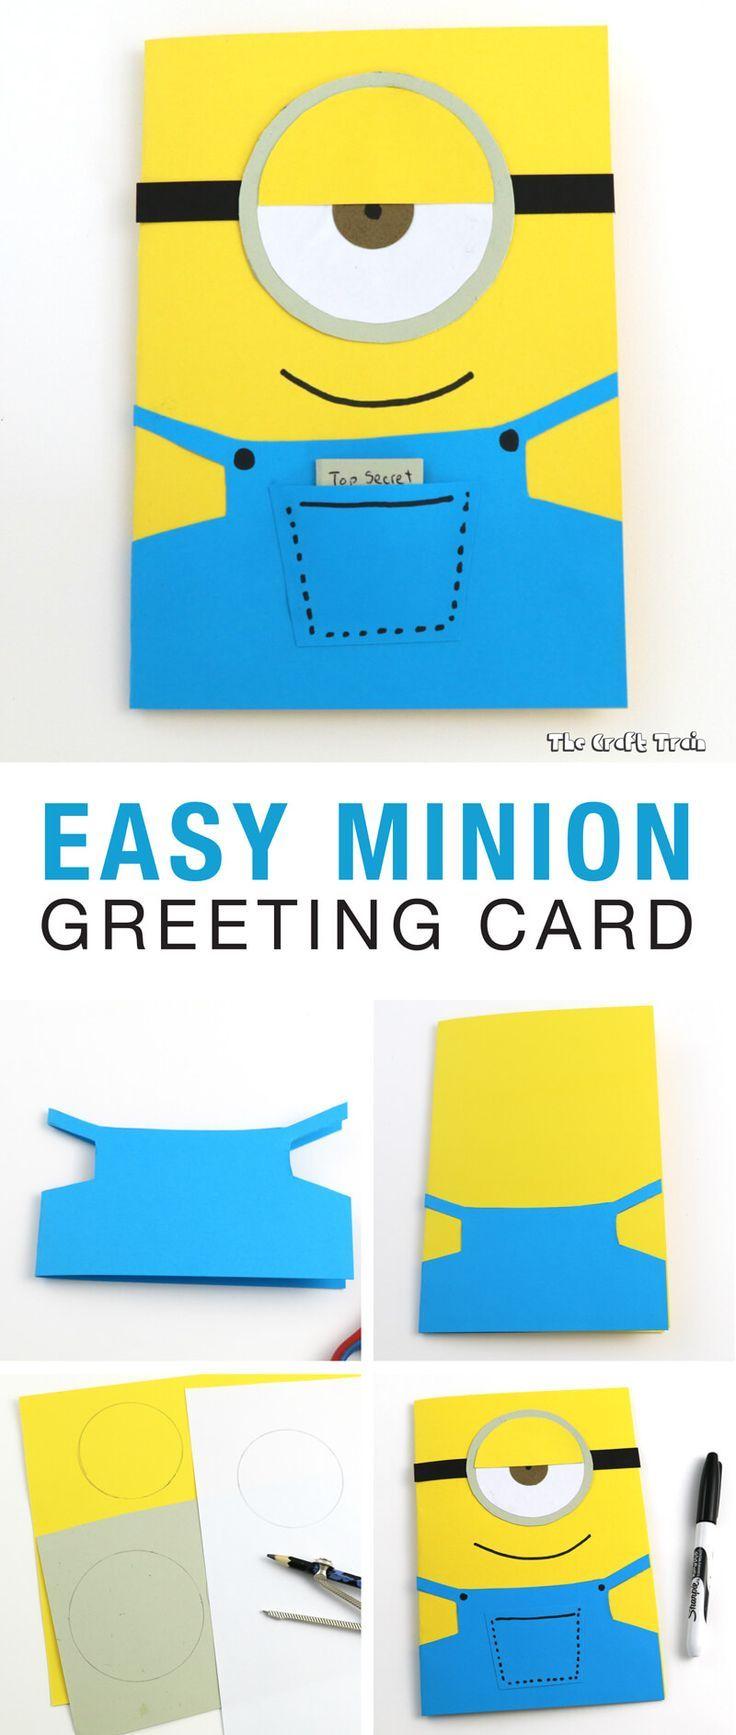 Easy Minion Greeting Card